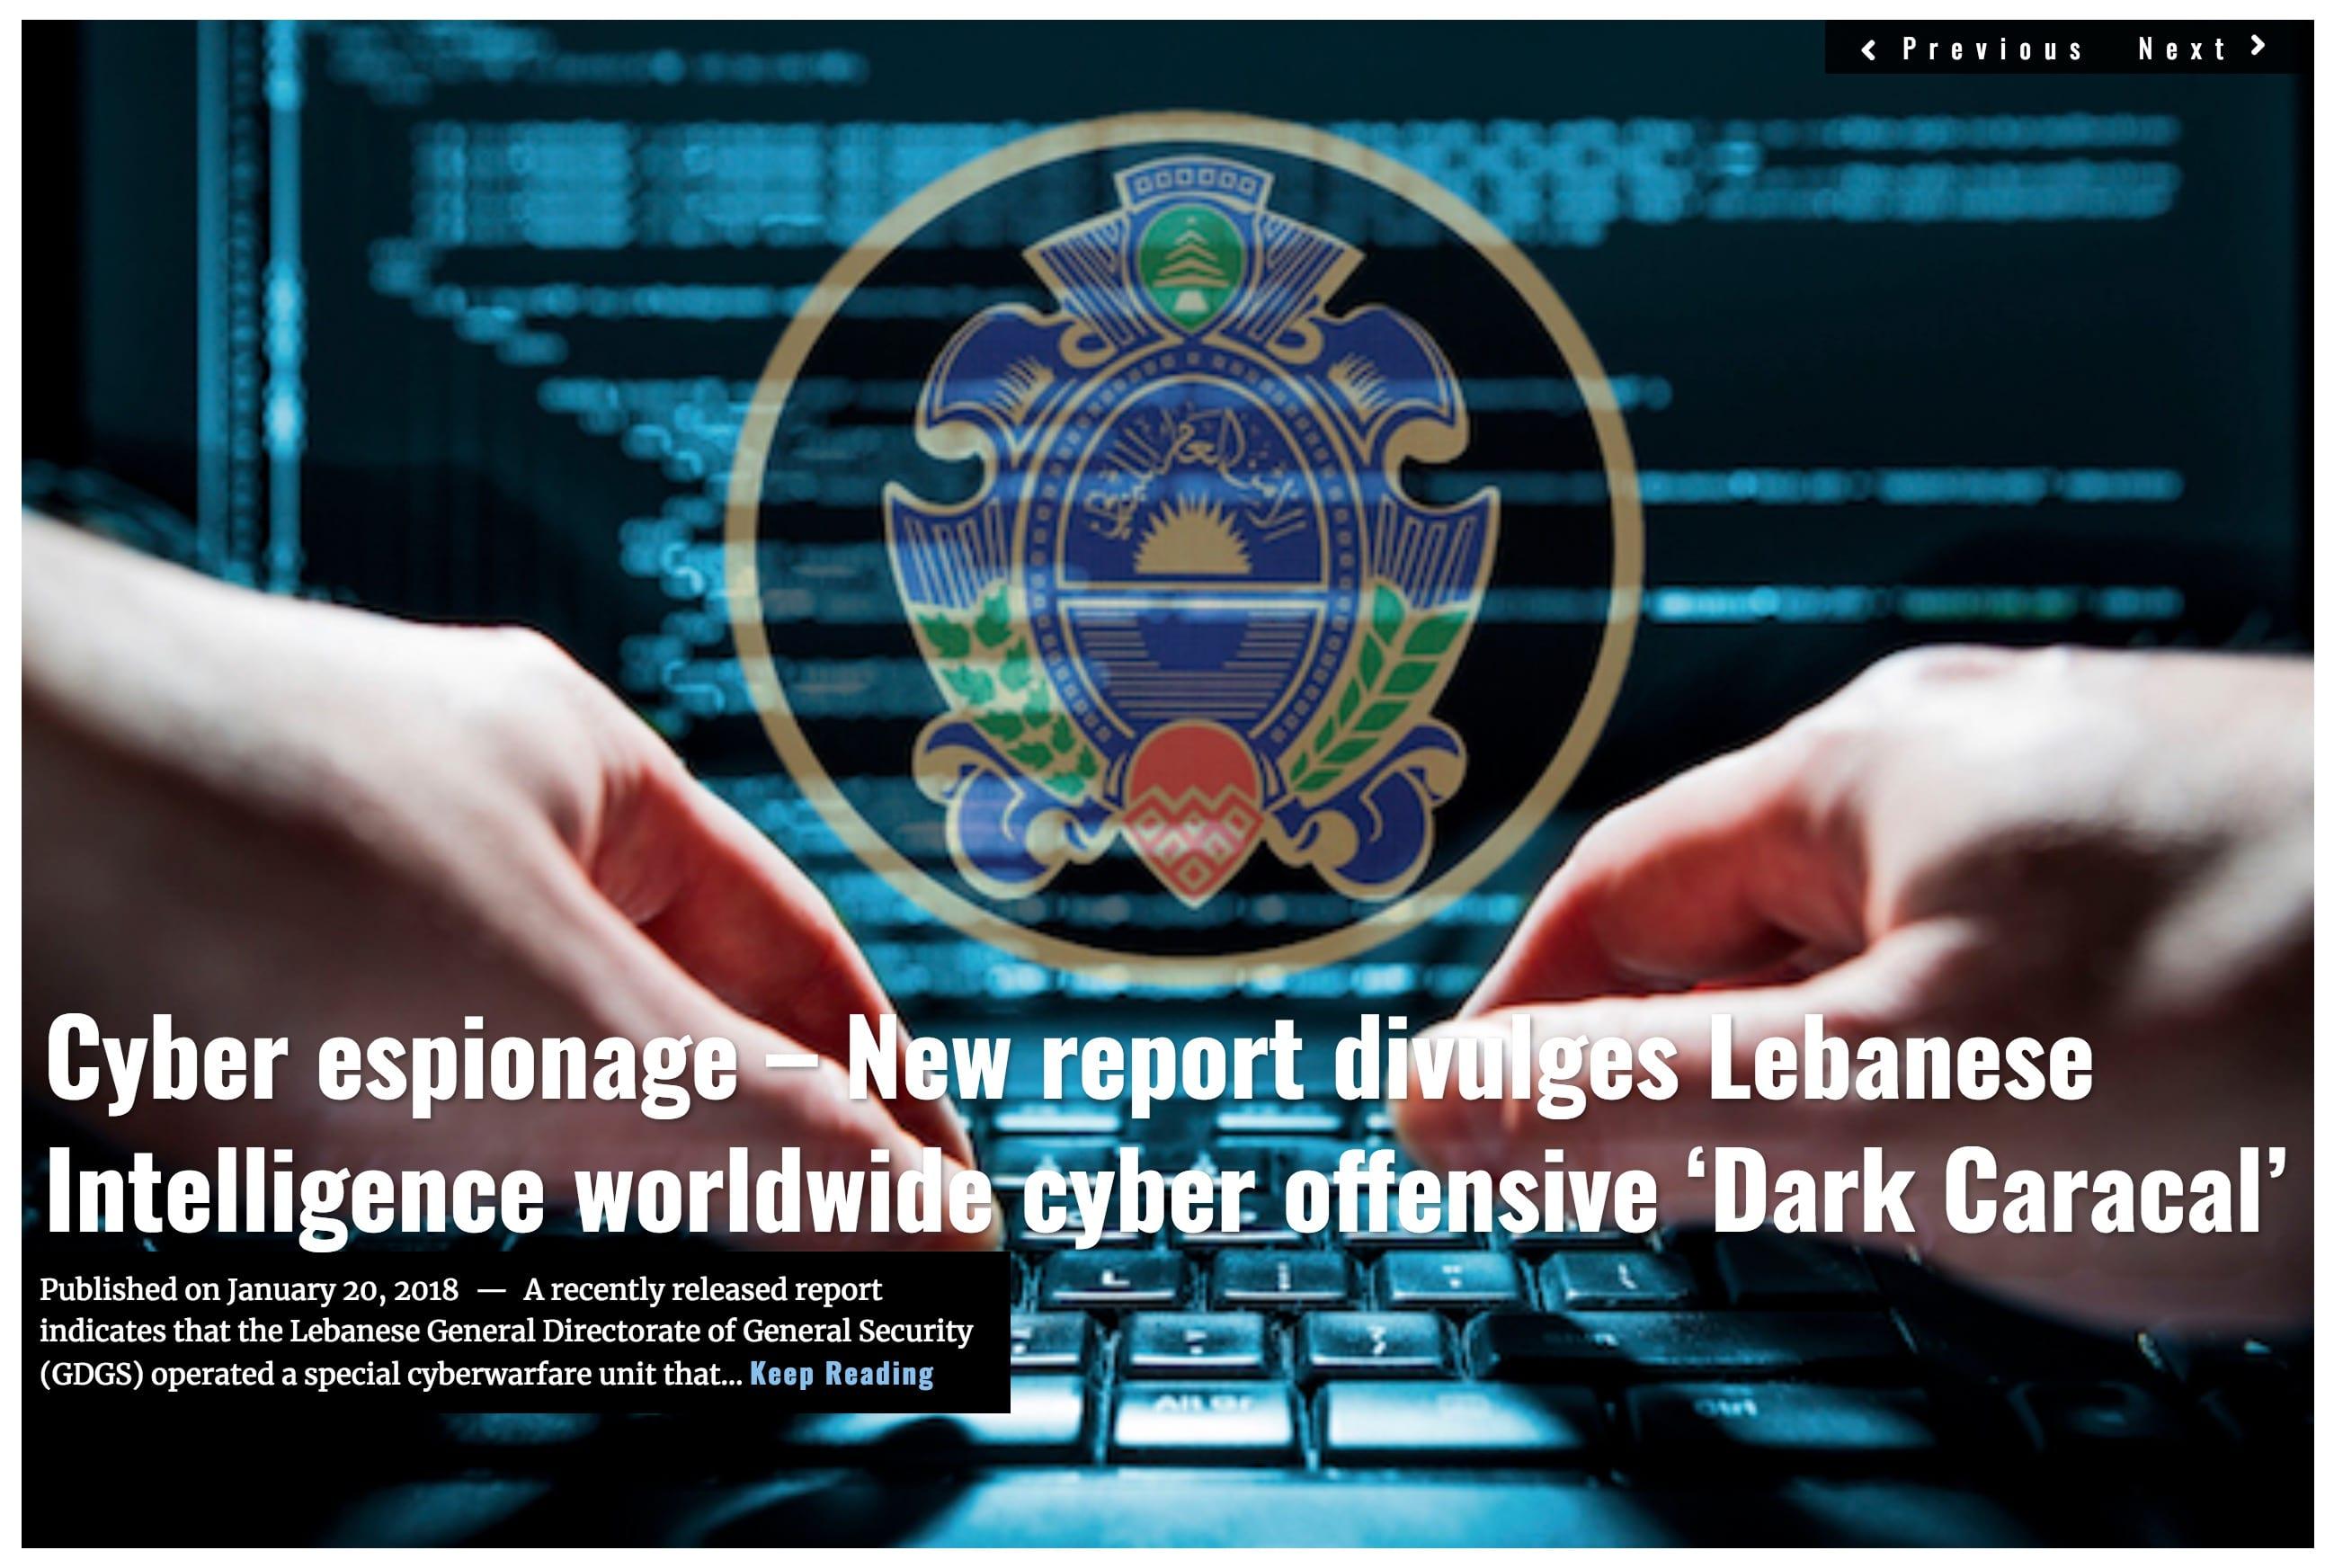 Image Lima Charlie News Headline Lebanon cyber espionage J.Sjoholm JAN 20